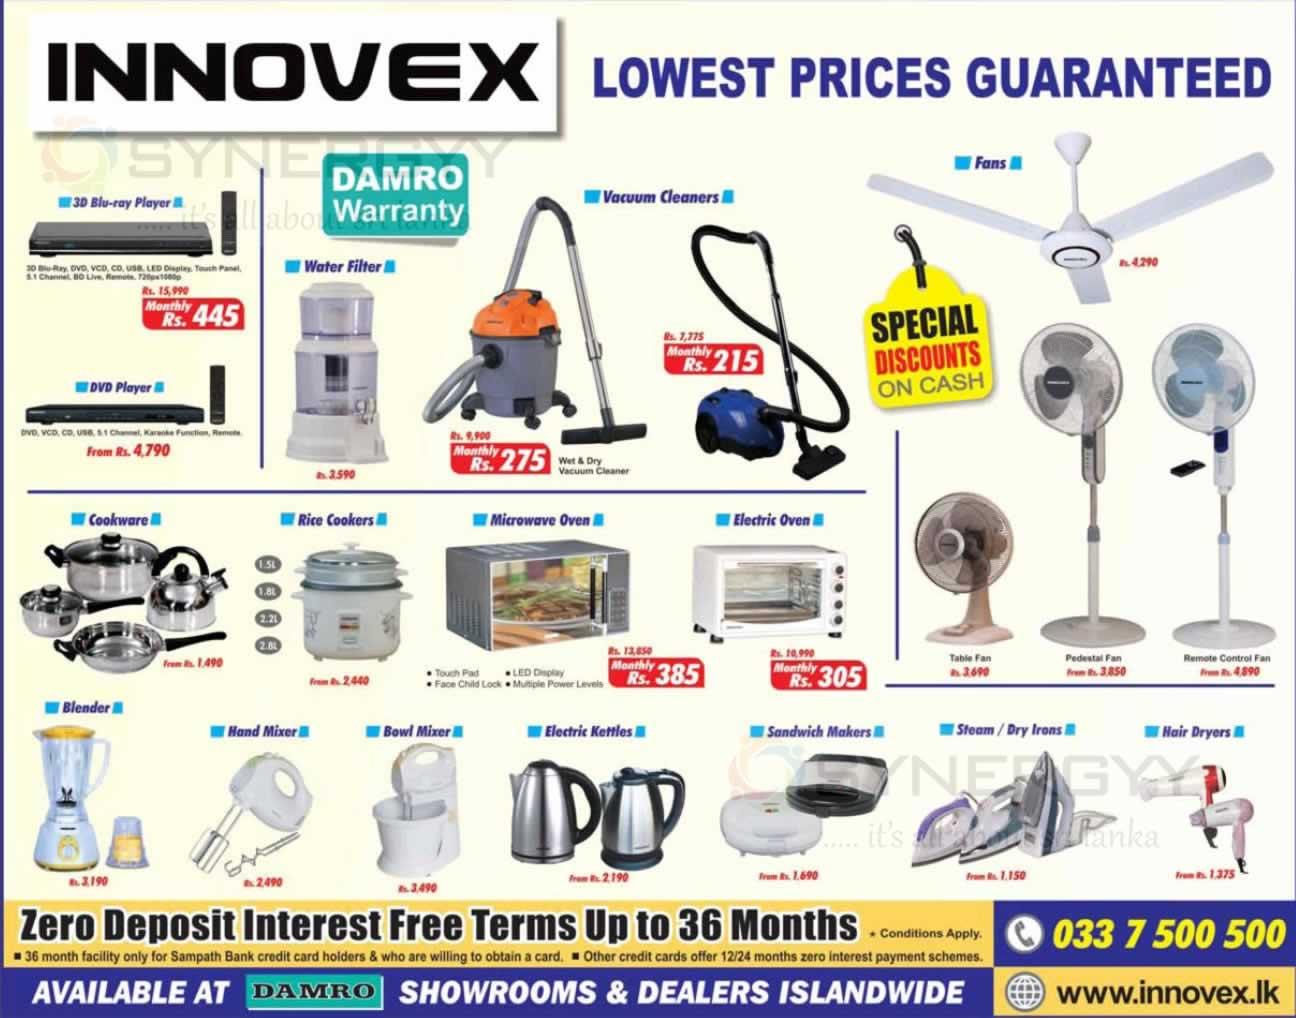 Free Download Damro Furniture Price For Sri Lanka Ask Home Design